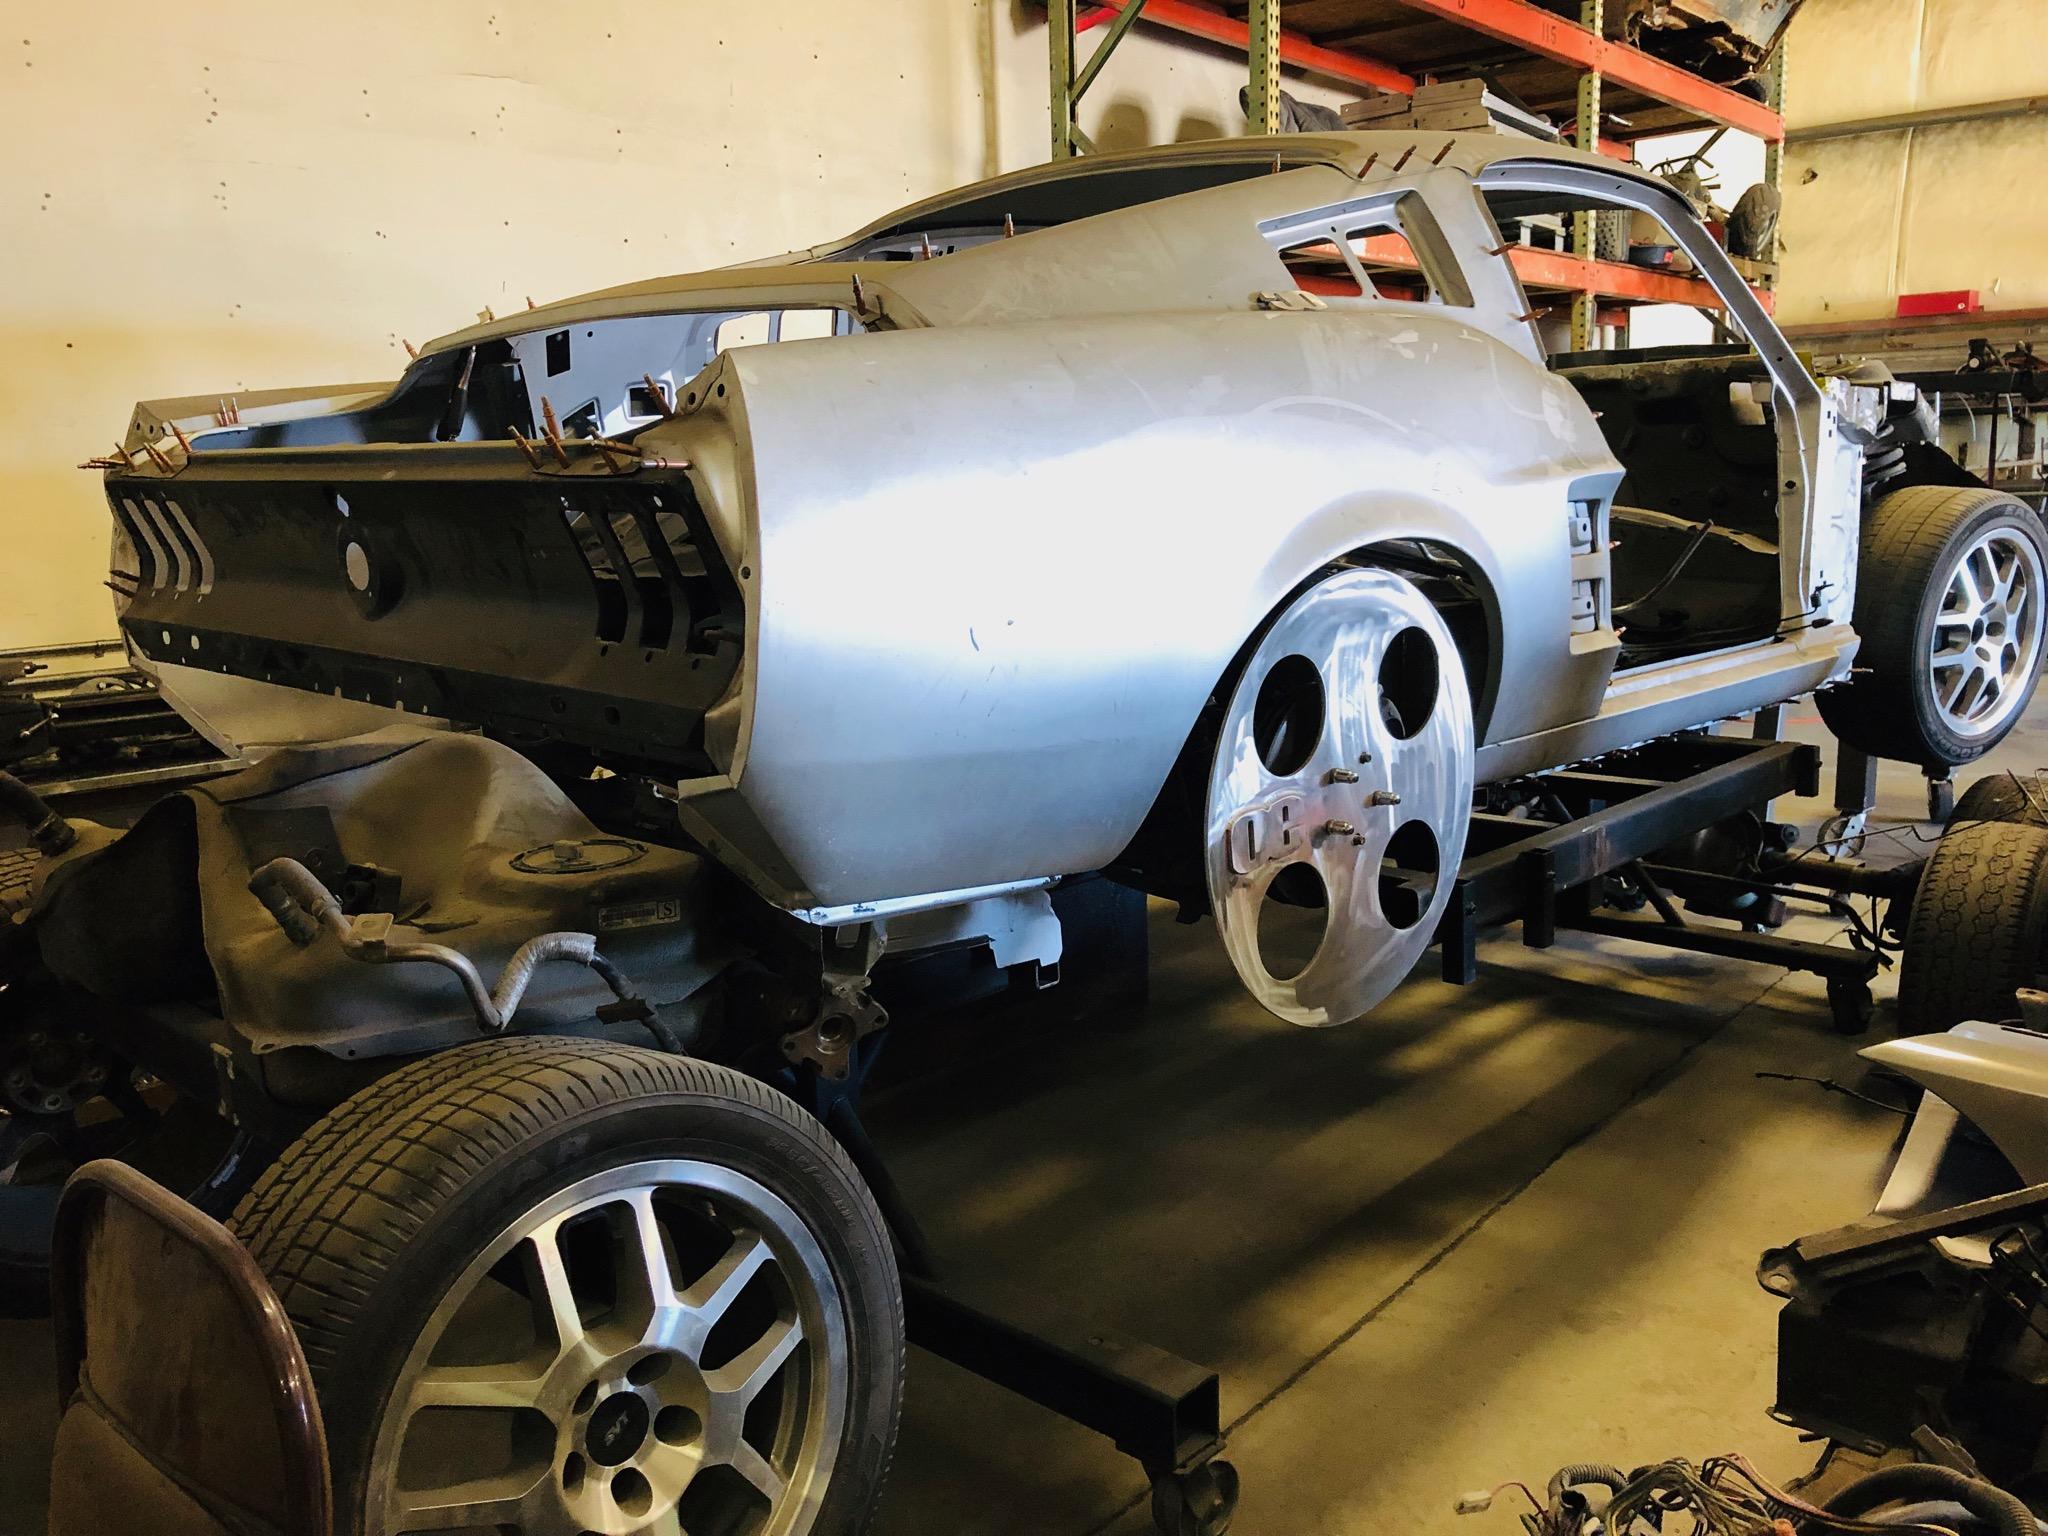 68 Mustang Build